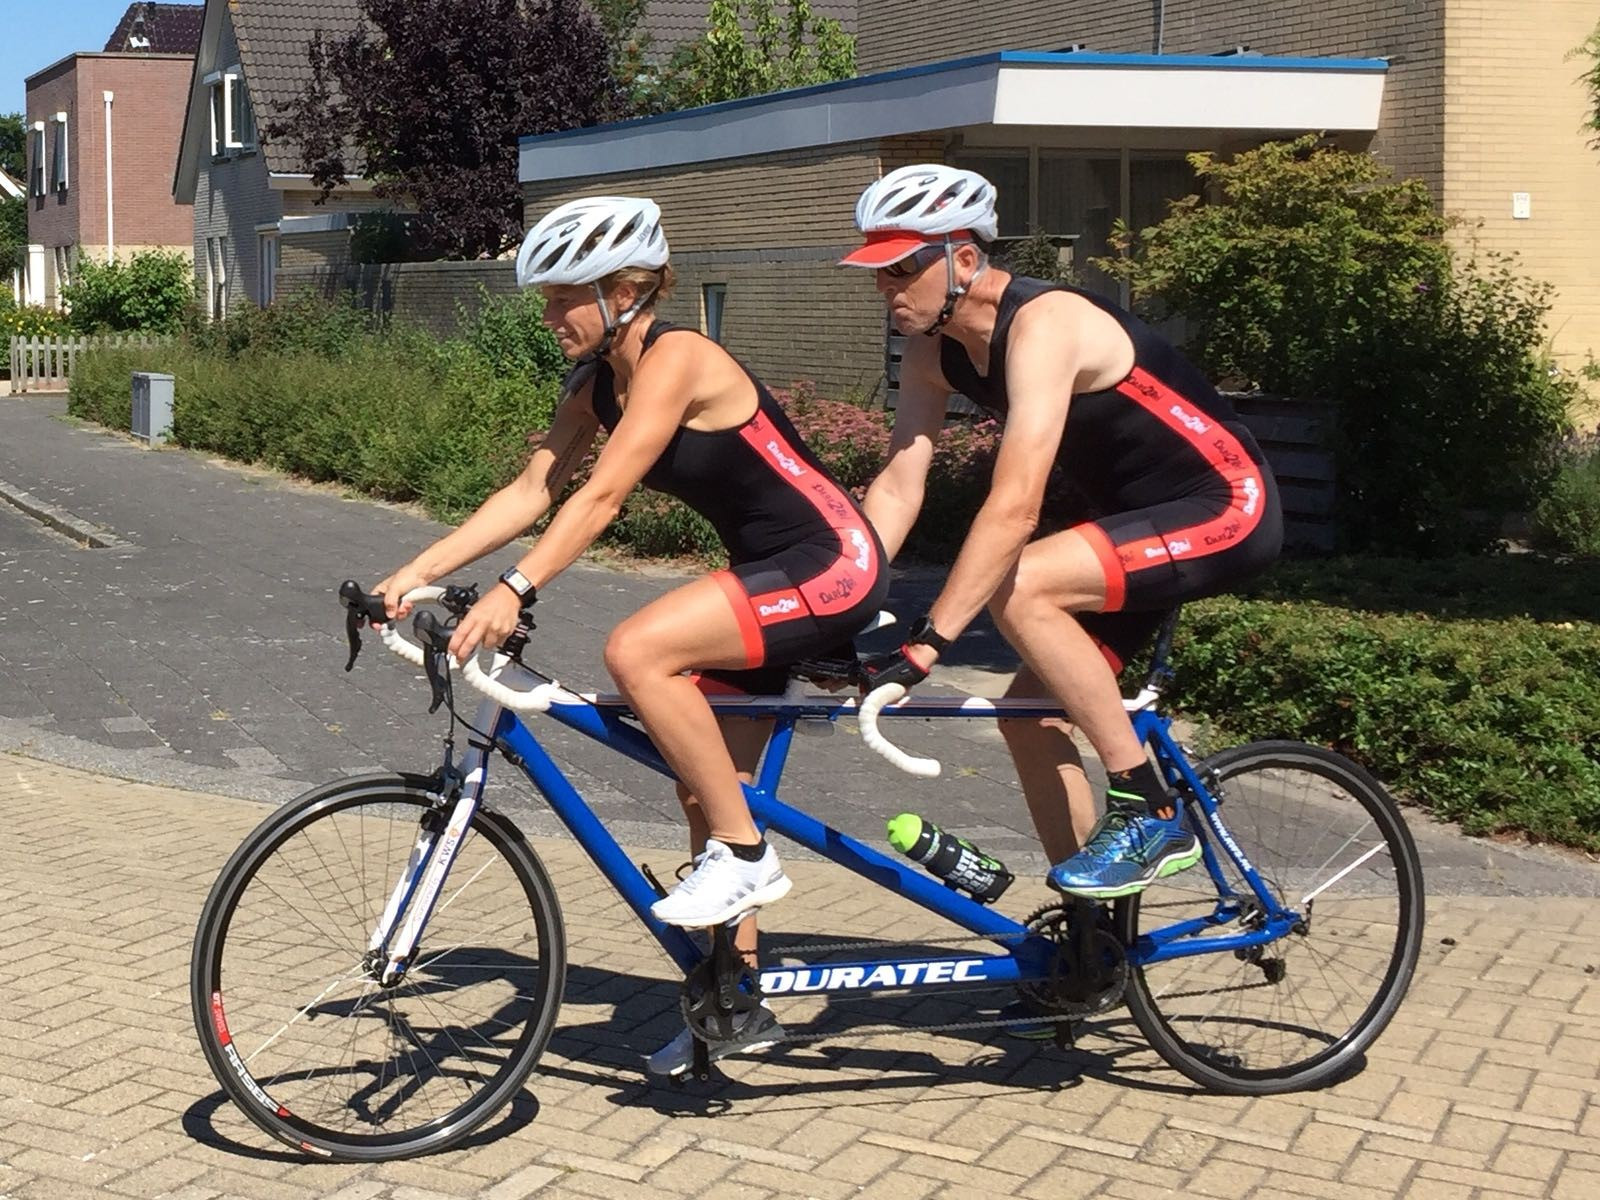 Mijn 1e triatlon voor de Sytske Foundation! Opbrengst € 220! Super gedaan!